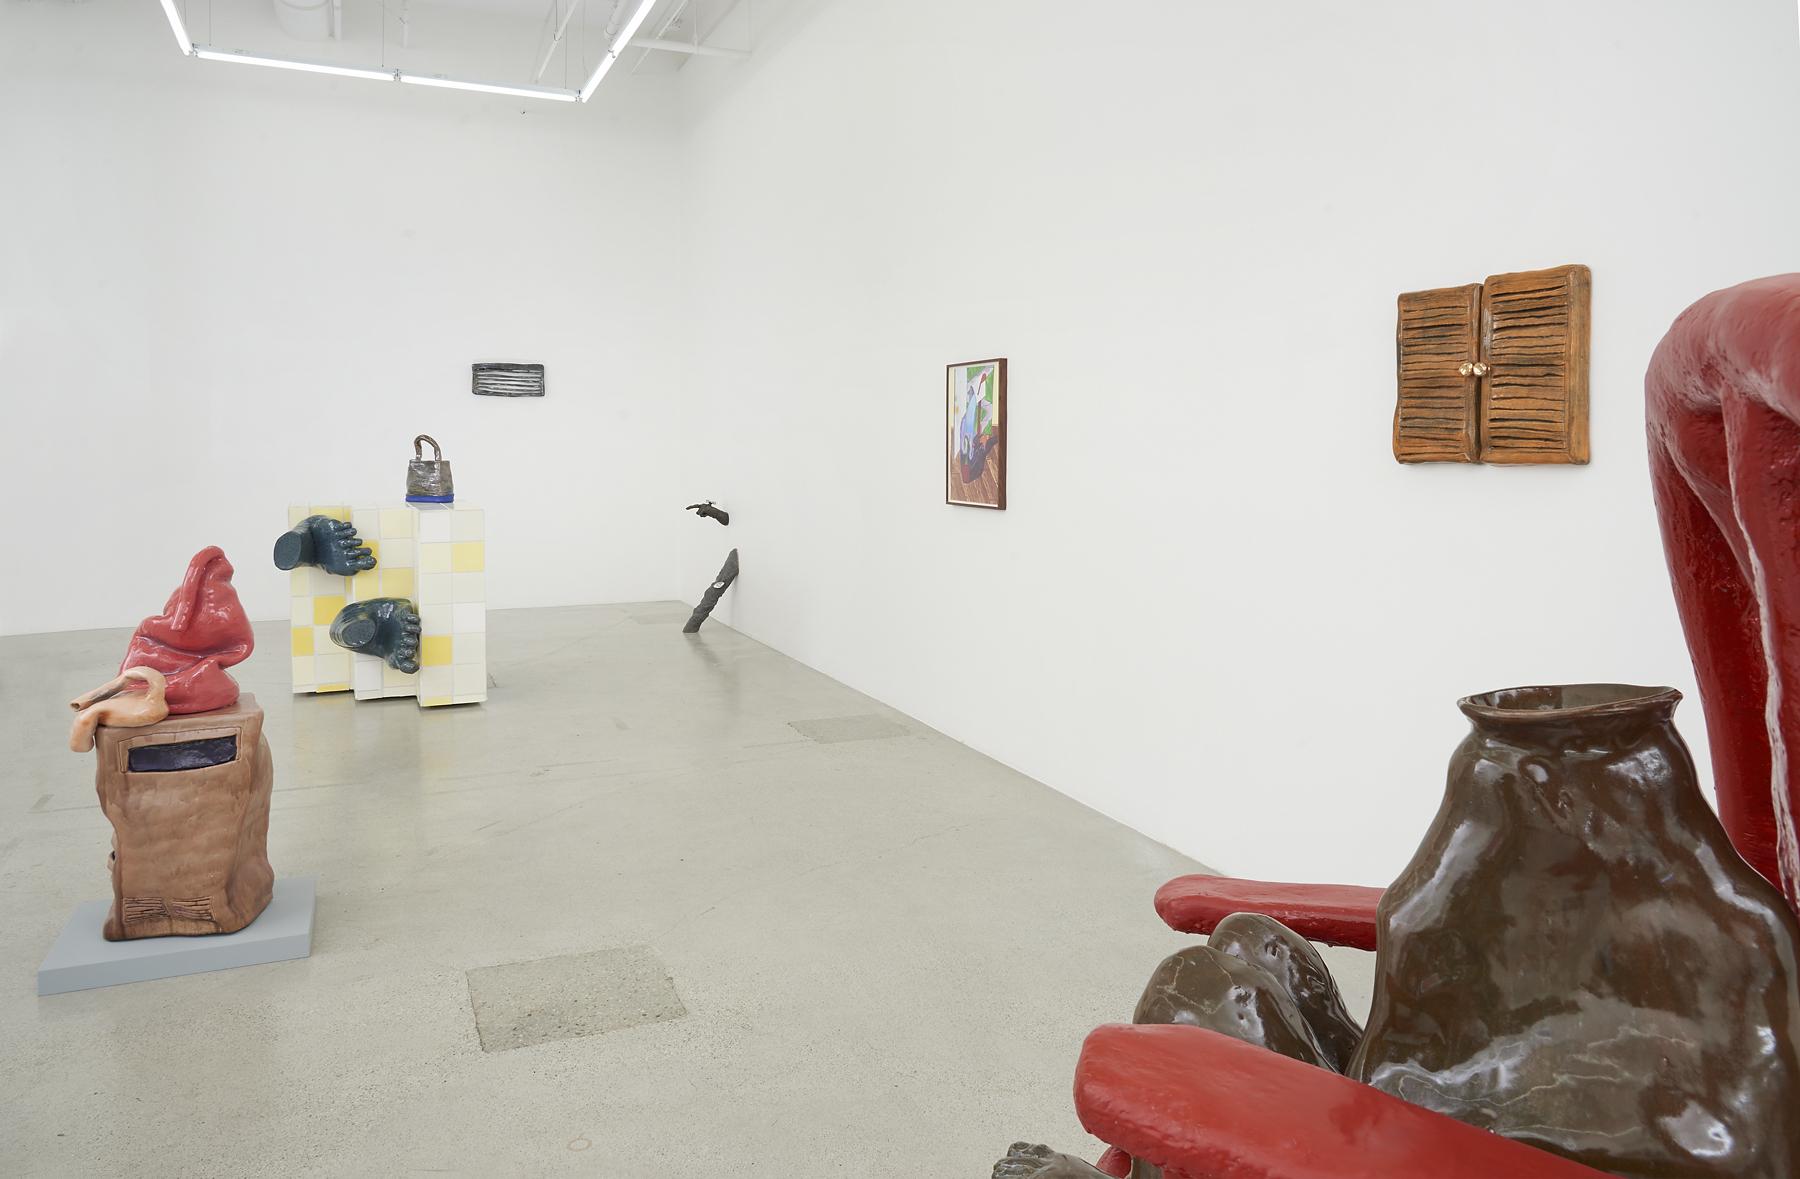 Othello_Living Room, 2018_Jessica Silverman Gallery_Installation view 02.PRS.jpg